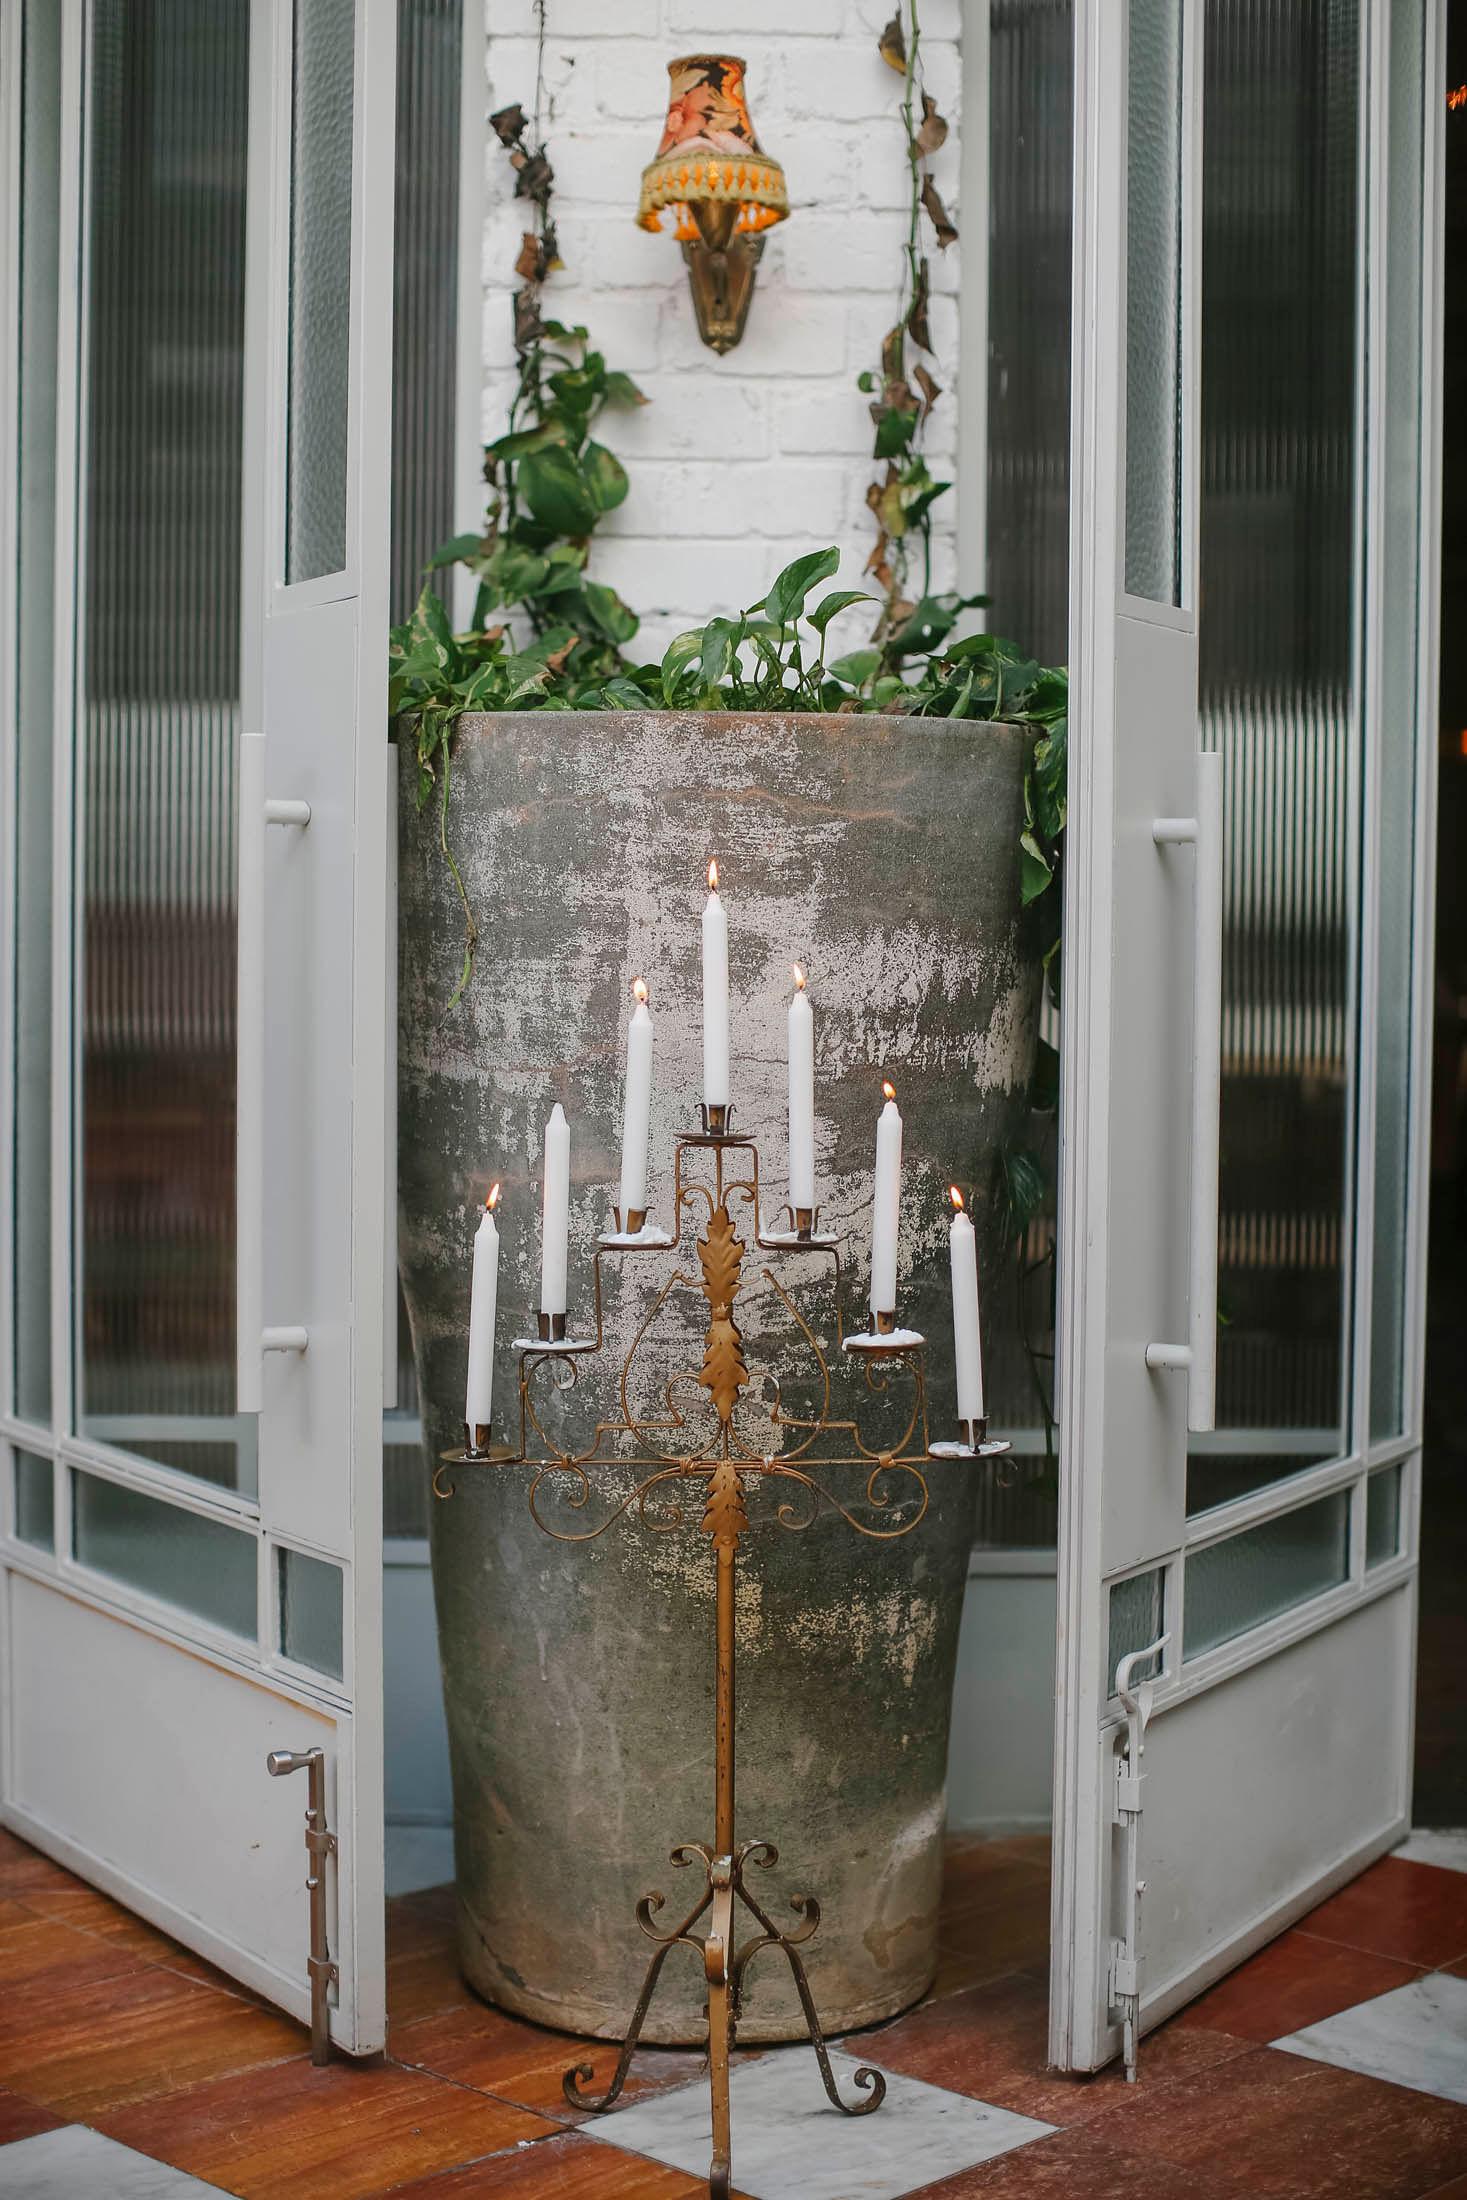 Lara + Cass juliet's bedroom ceremony entrance bohemian blooms